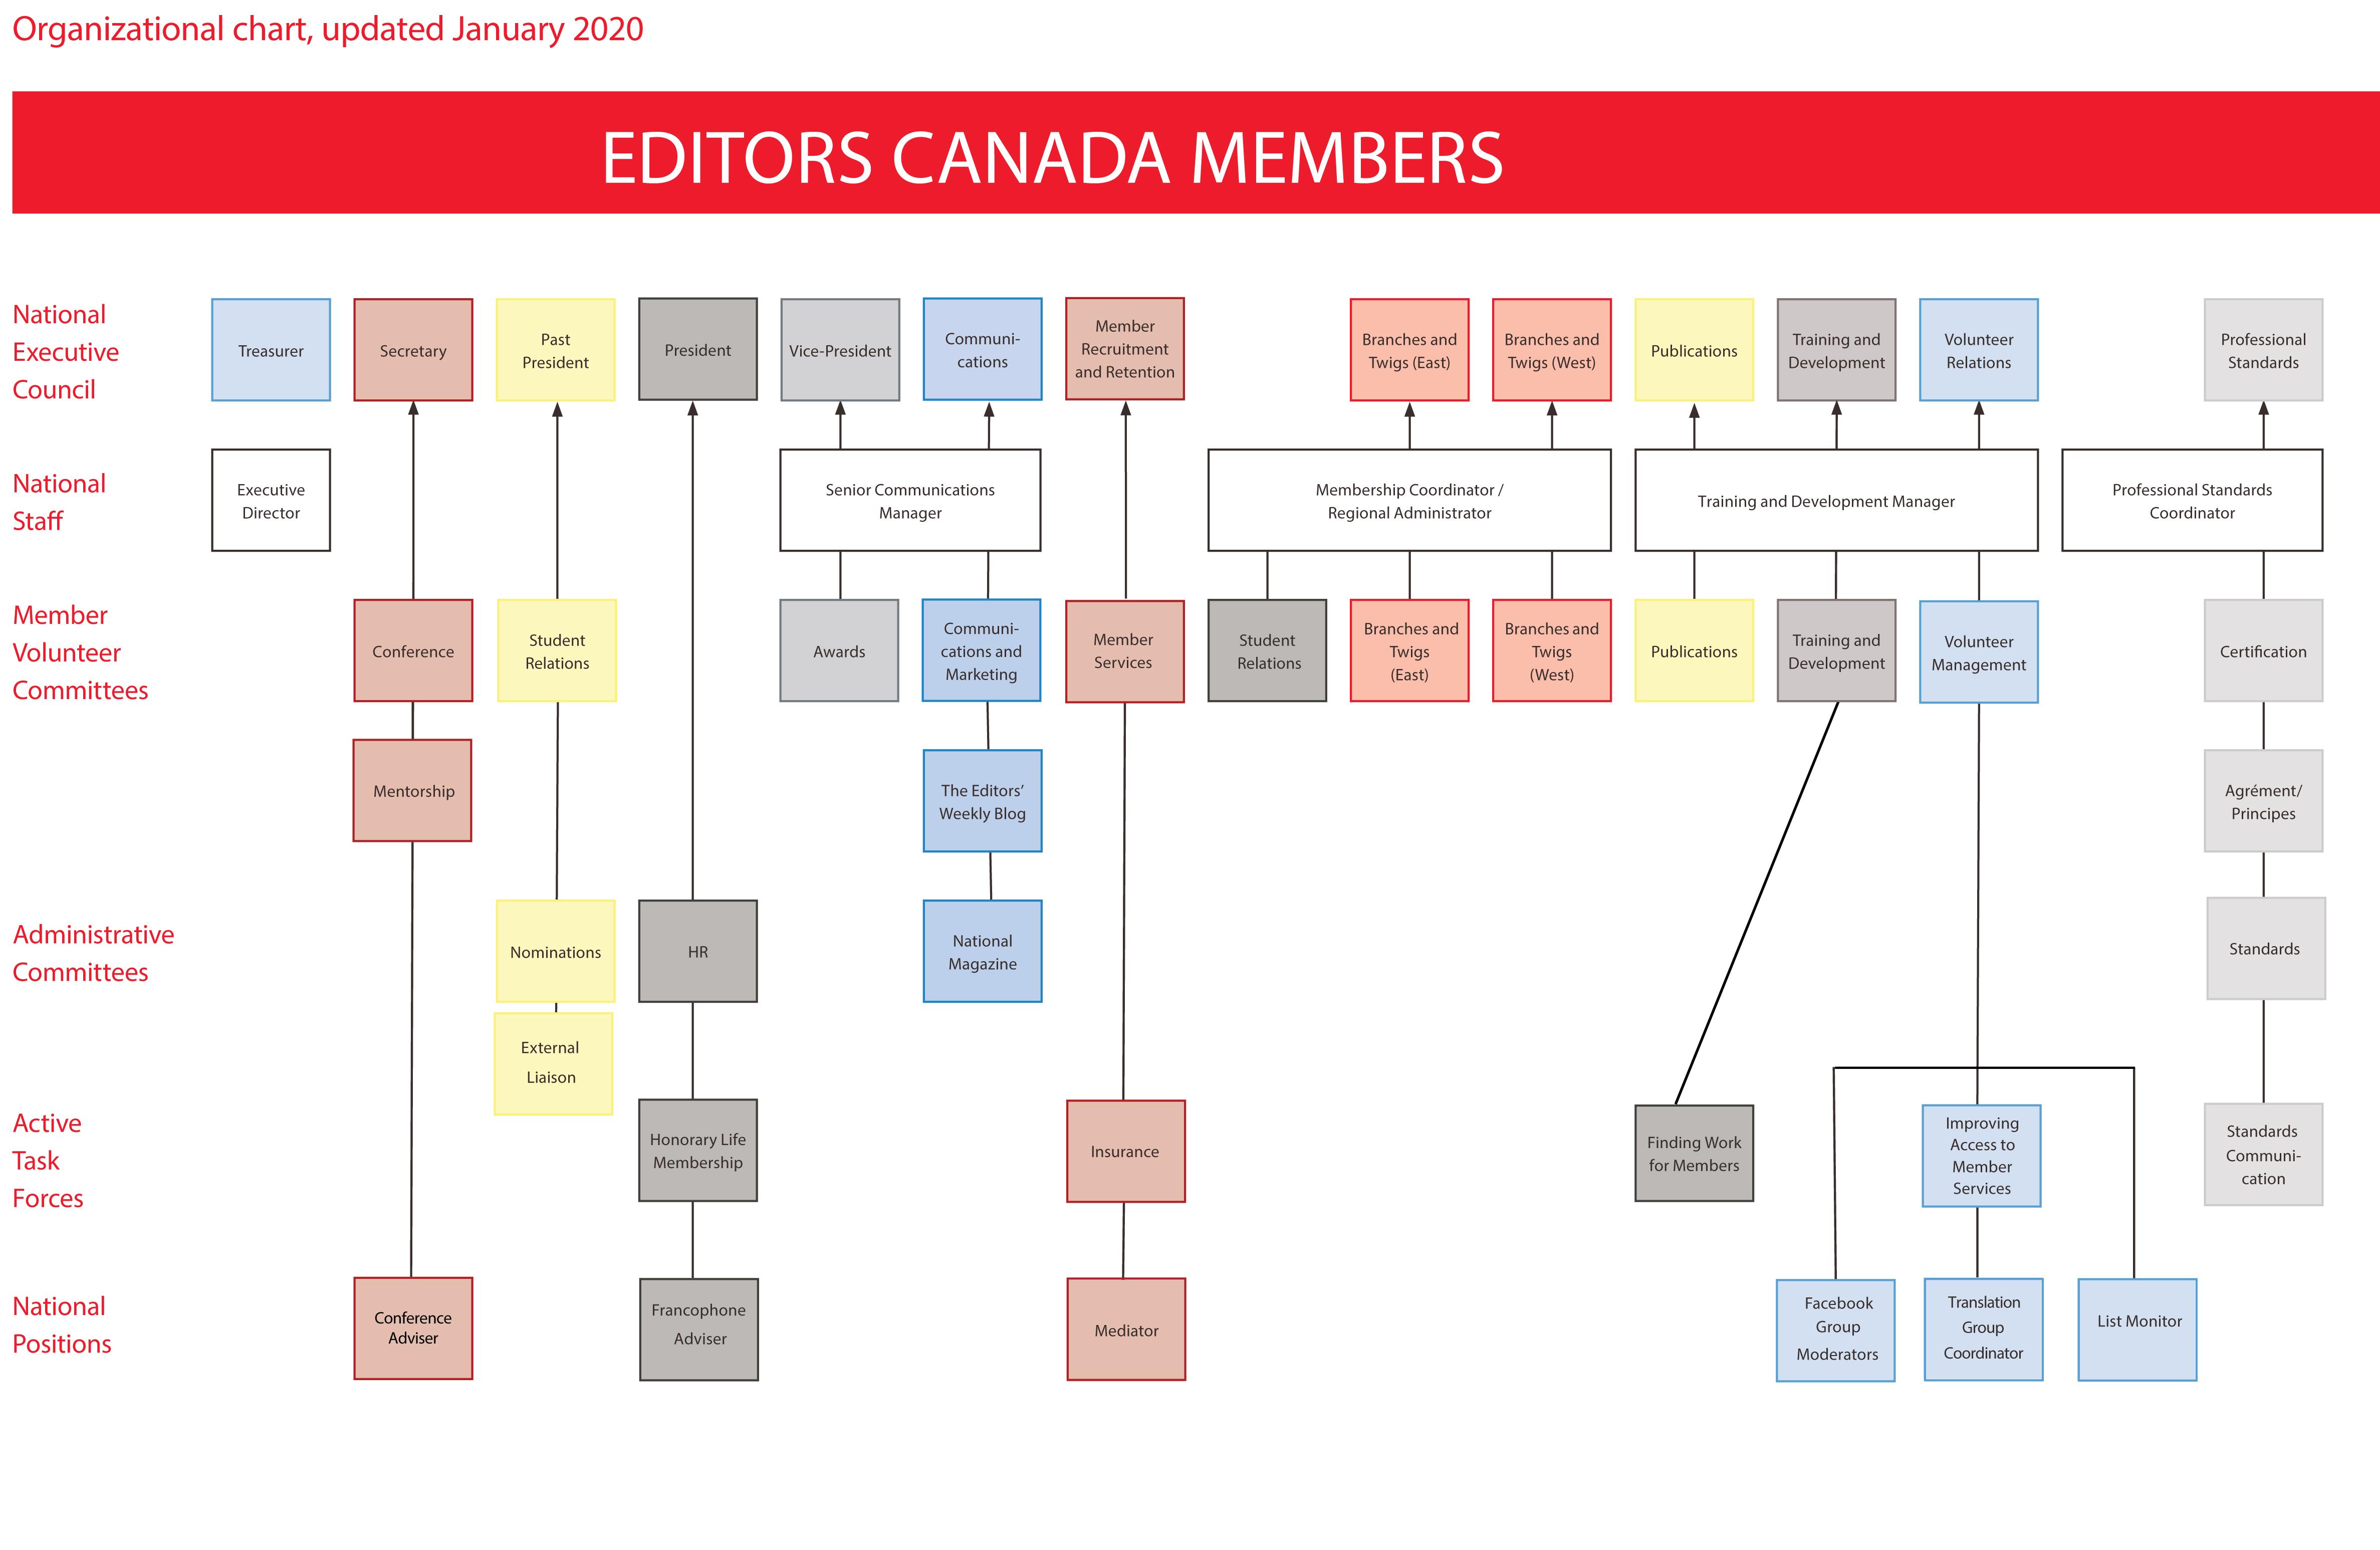 Editors Canada Organizational Chart (January 2020)